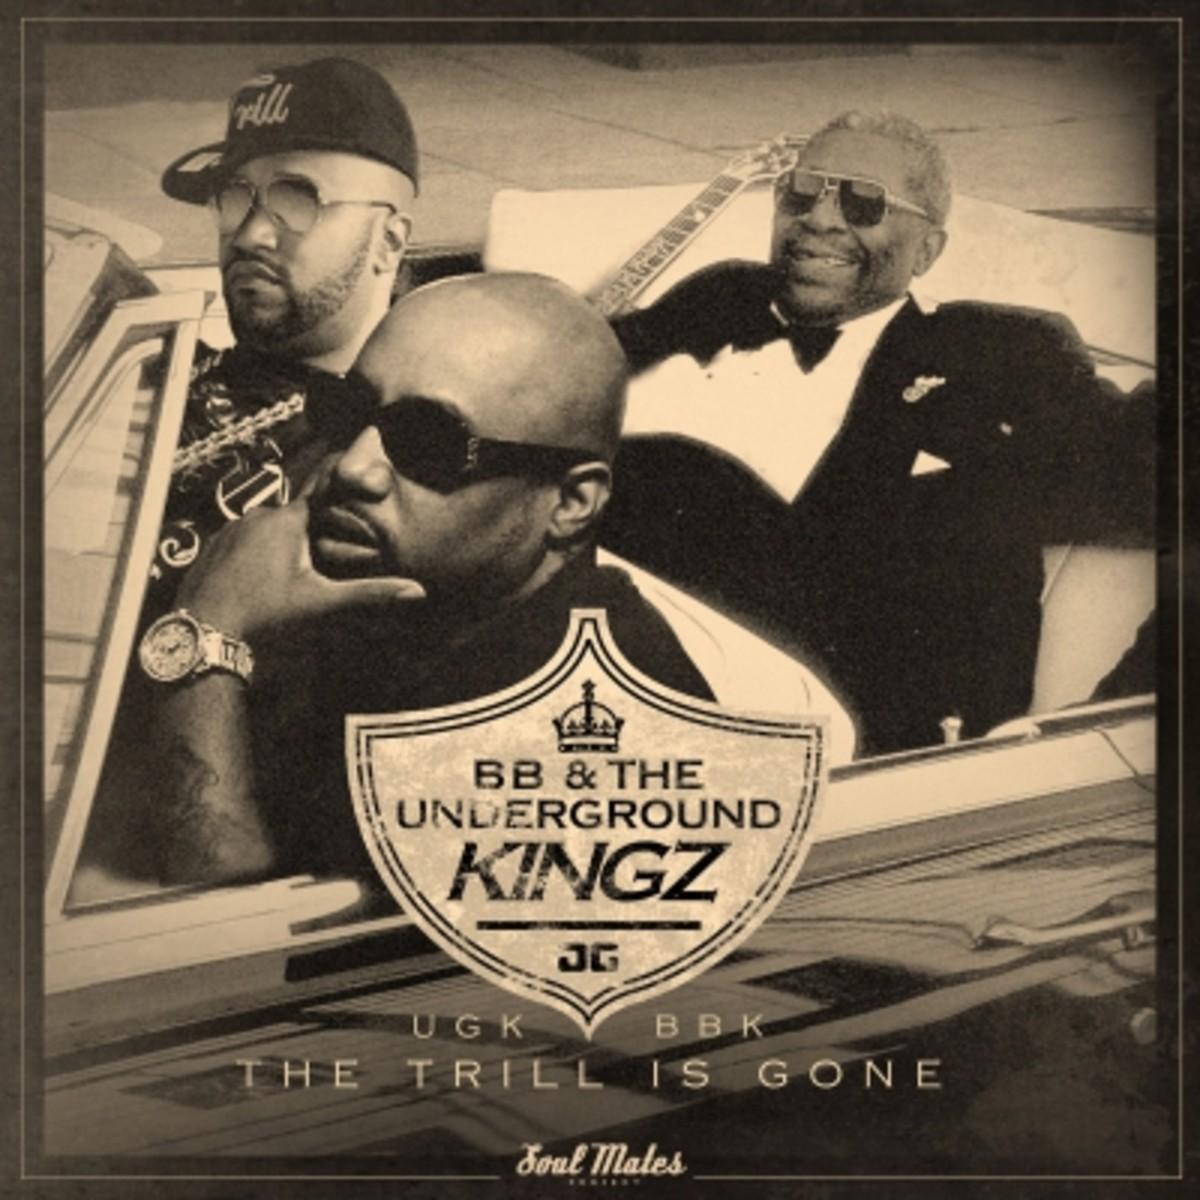 B B  & The Underground Kingz (UGK x B B  King) - Make Love